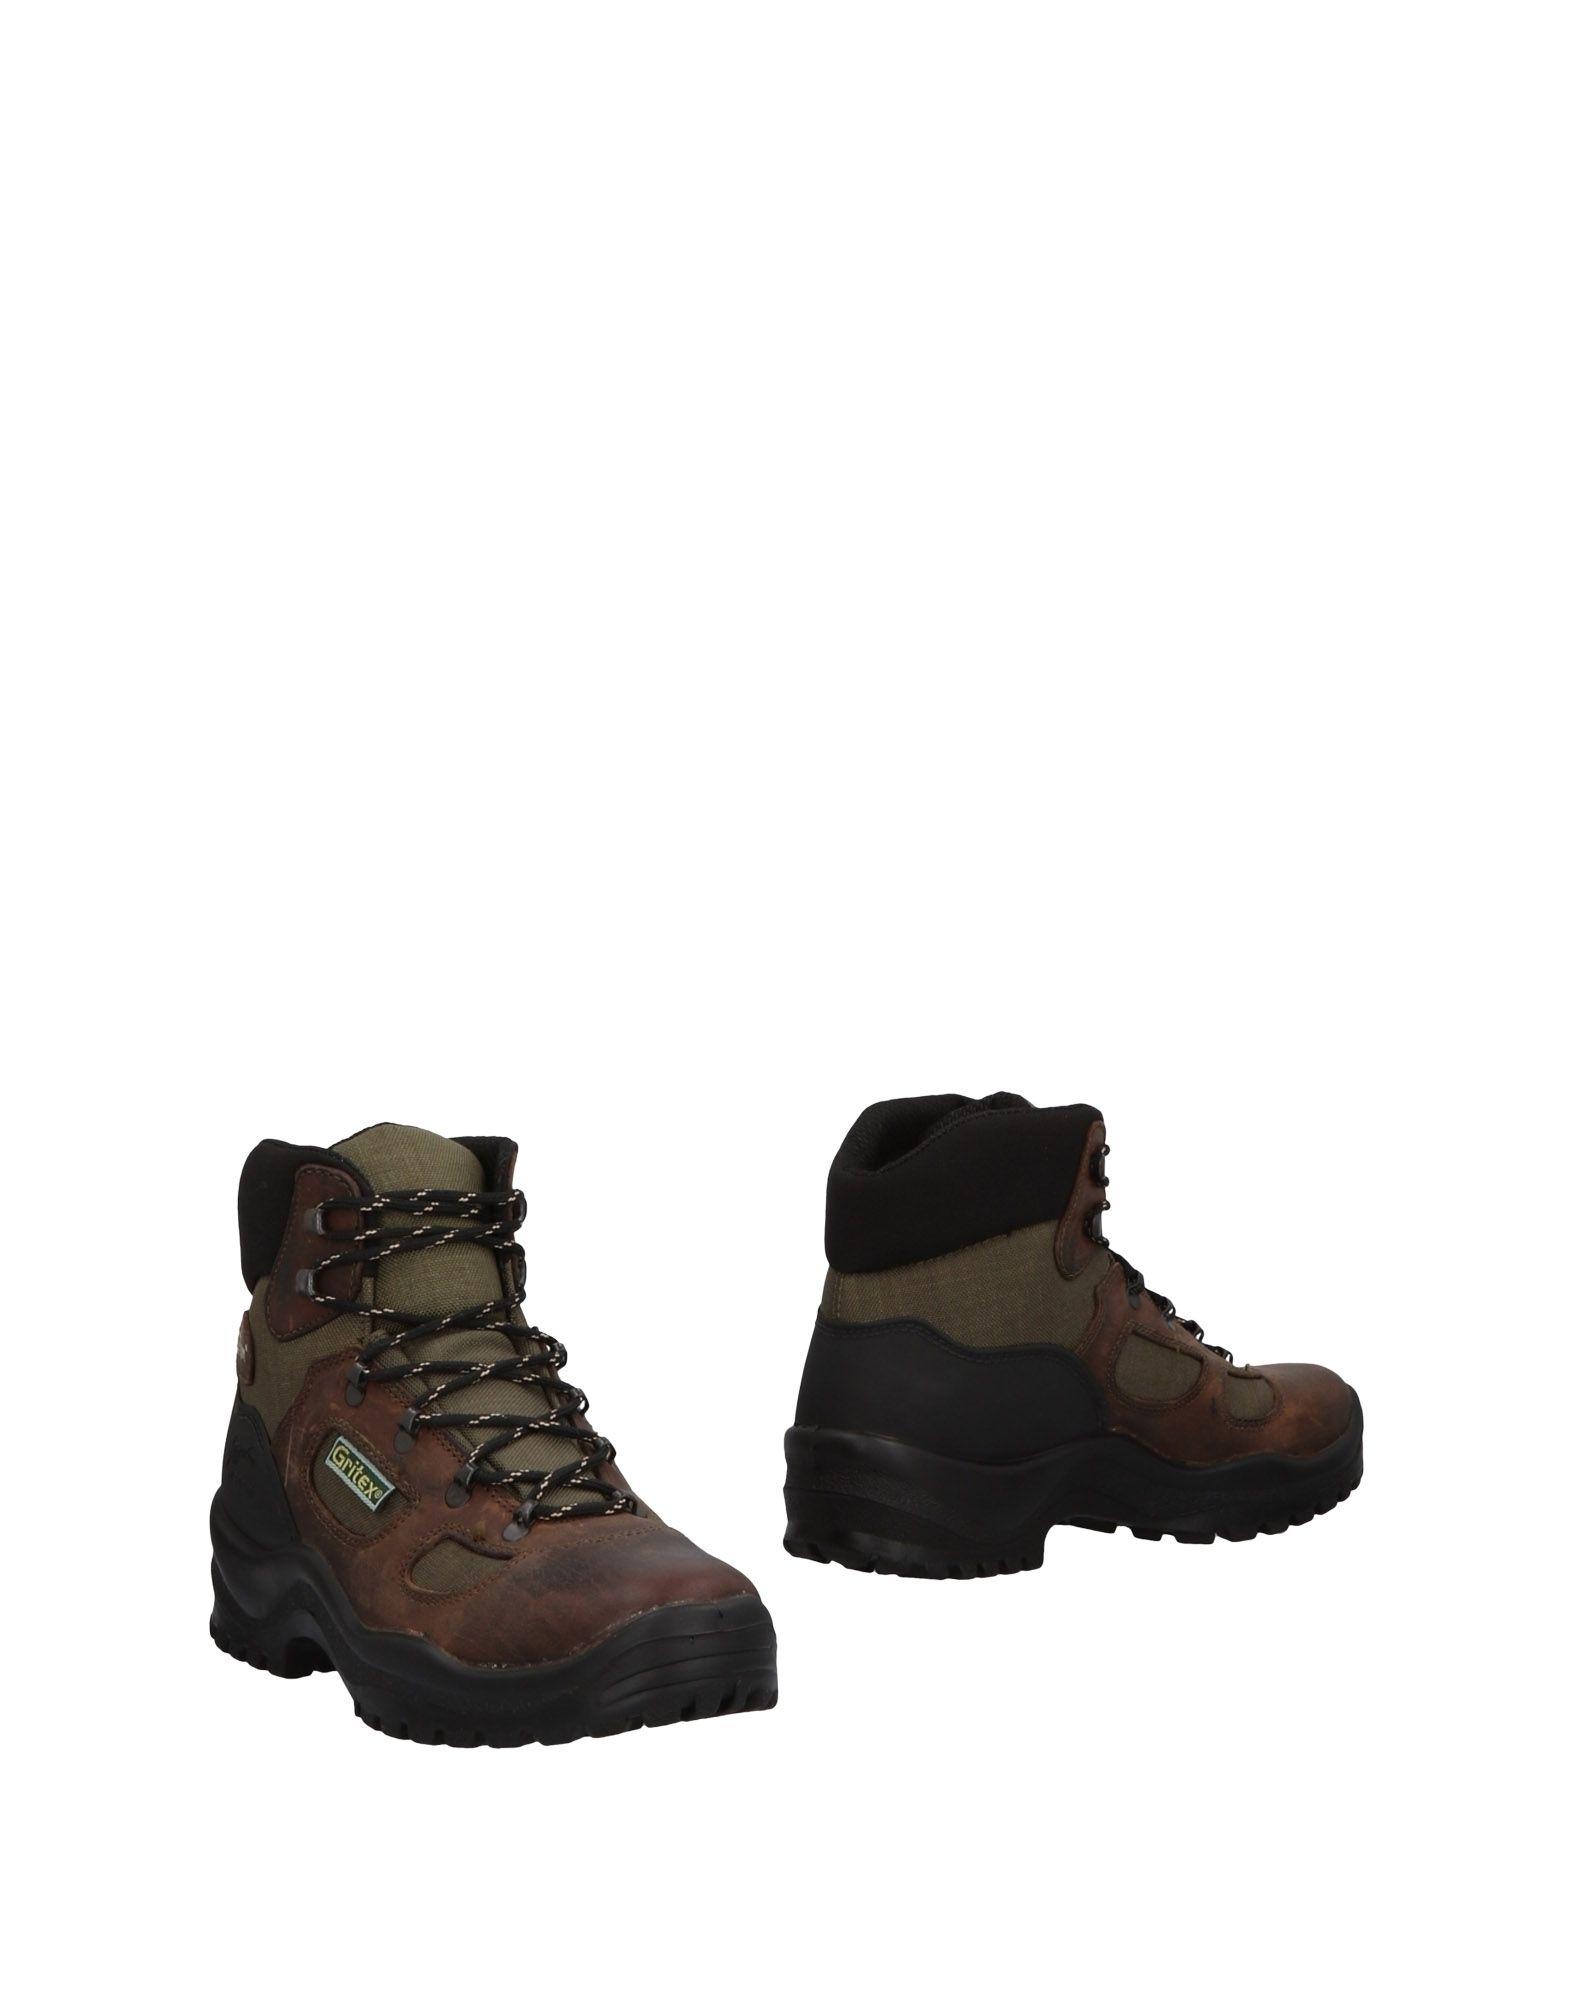 11465124GK Grisport Stiefelette Herren  11465124GK  Heiße Schuhe 58e4b0